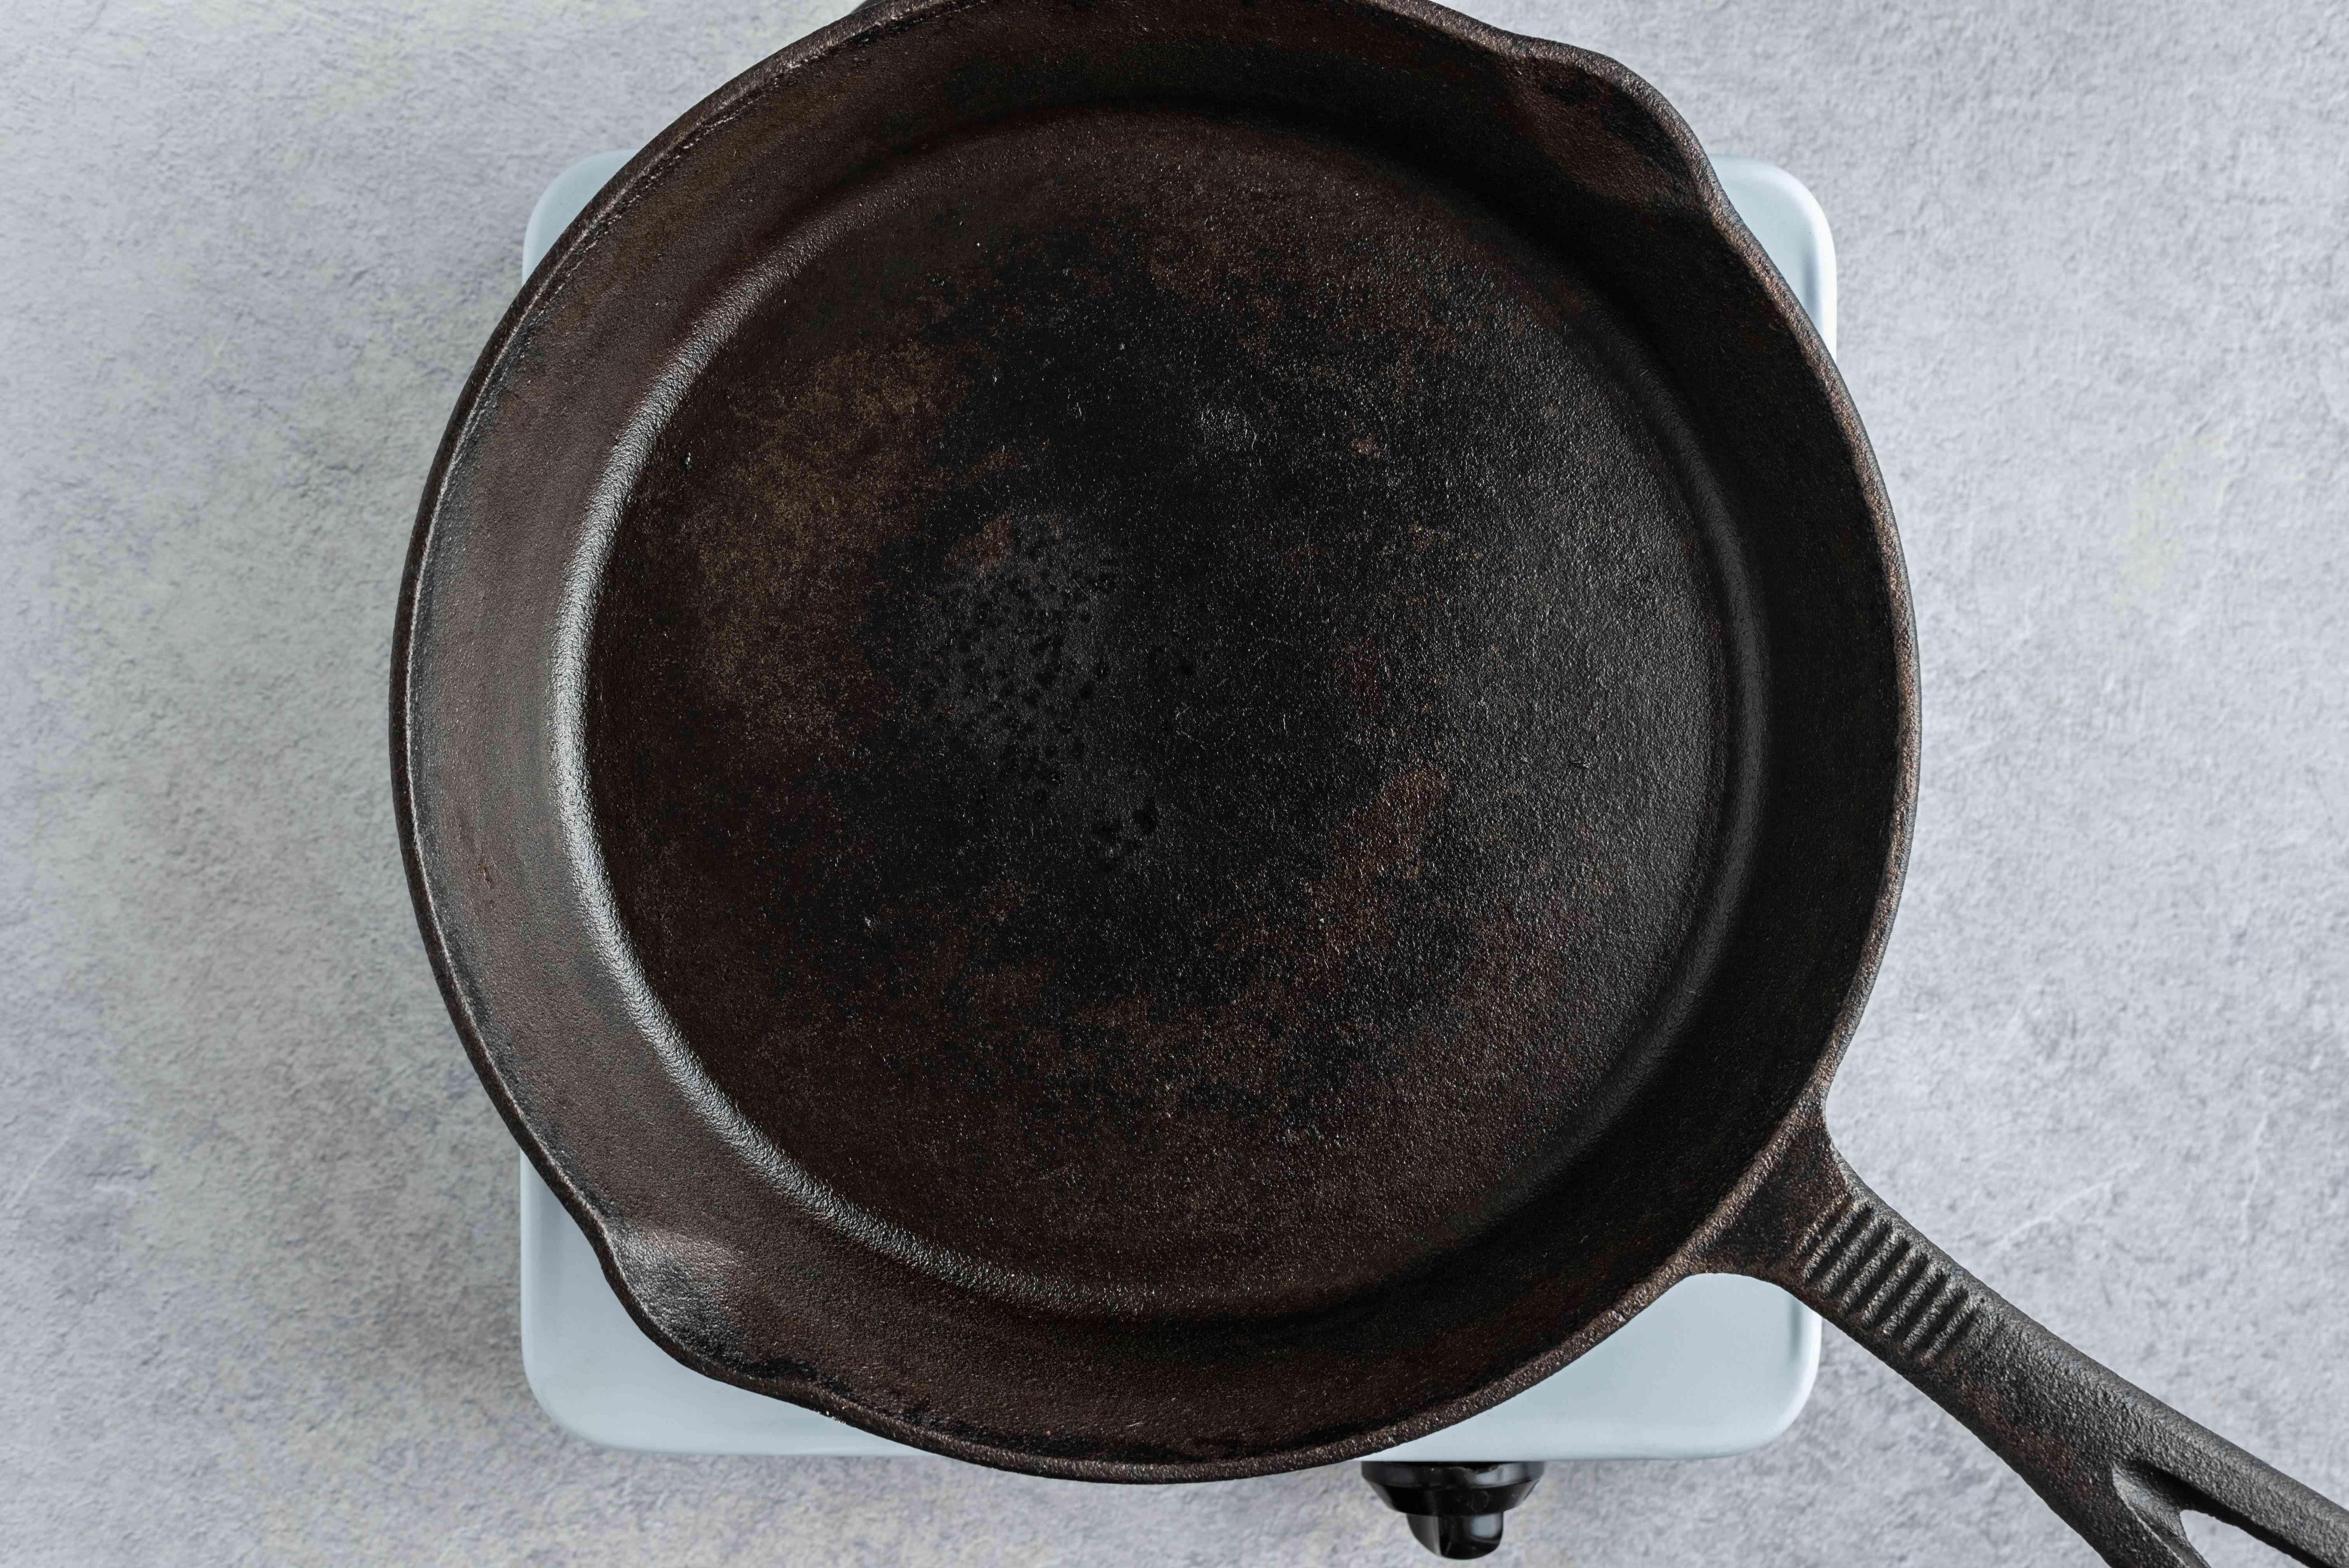 cast-iron pan on a burner